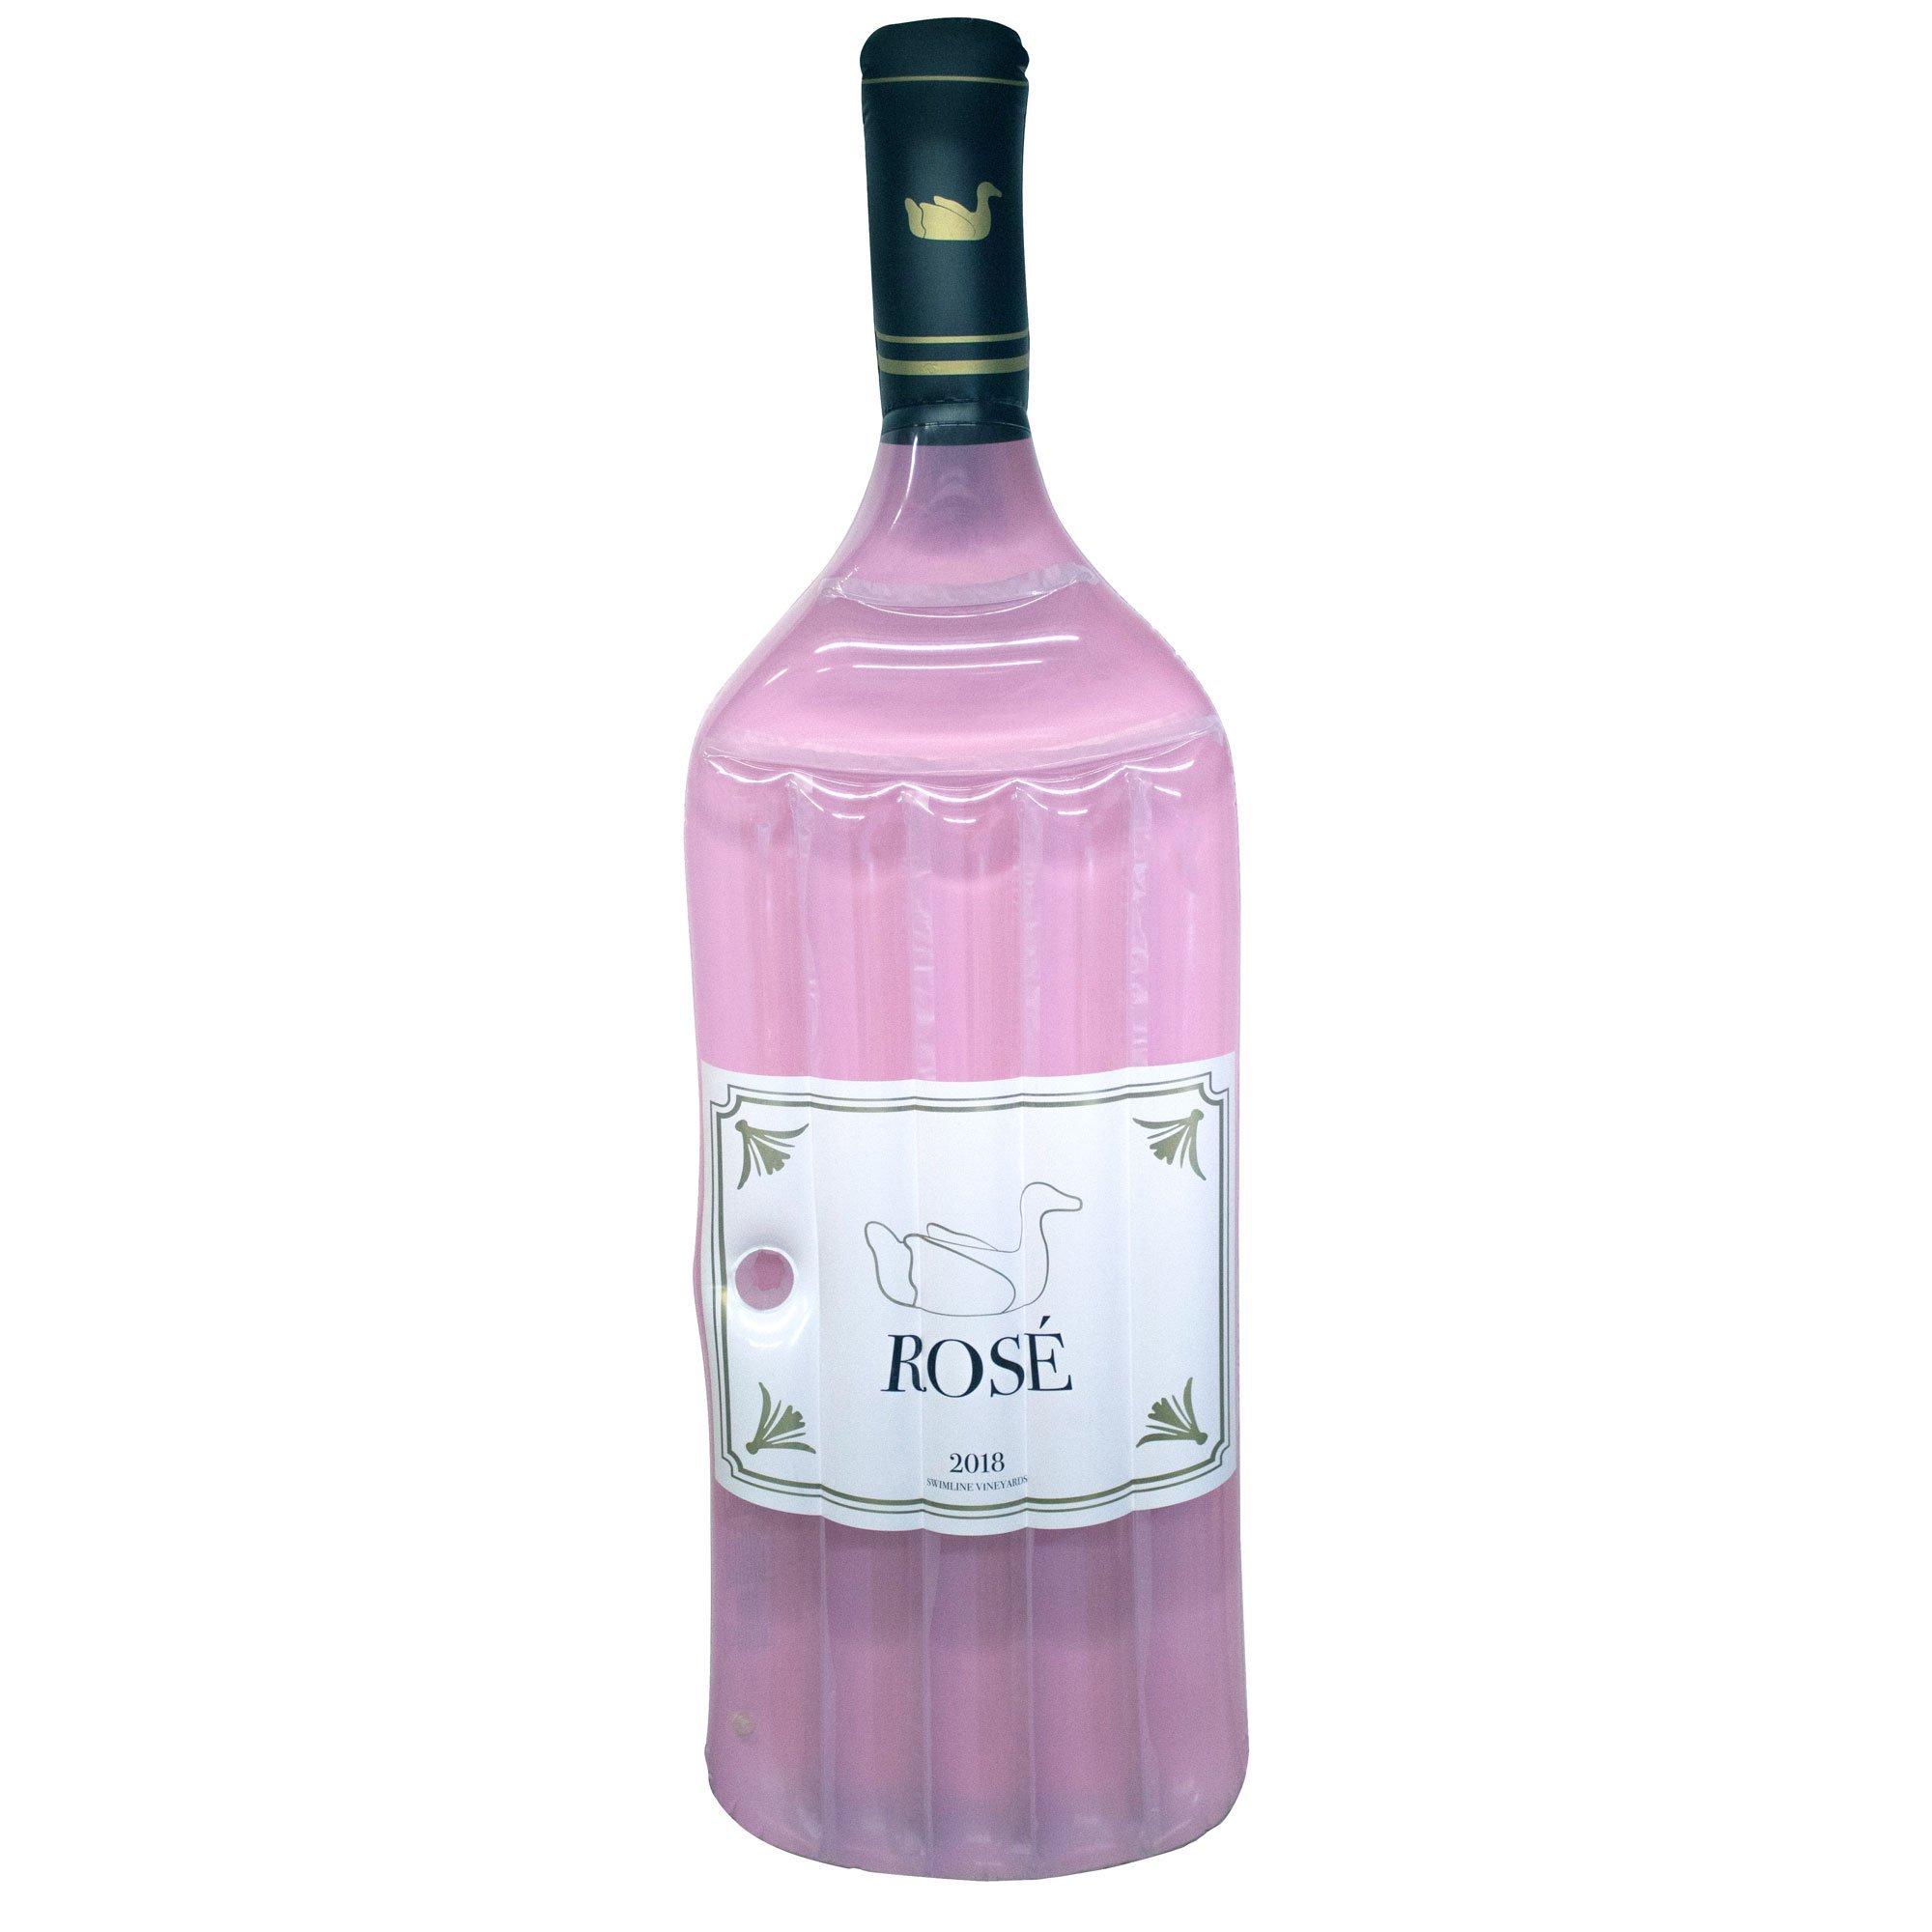 Swimline 90654 Inflatable Rose Wine Bottle Pool Float, One Size, Pink by Swimline